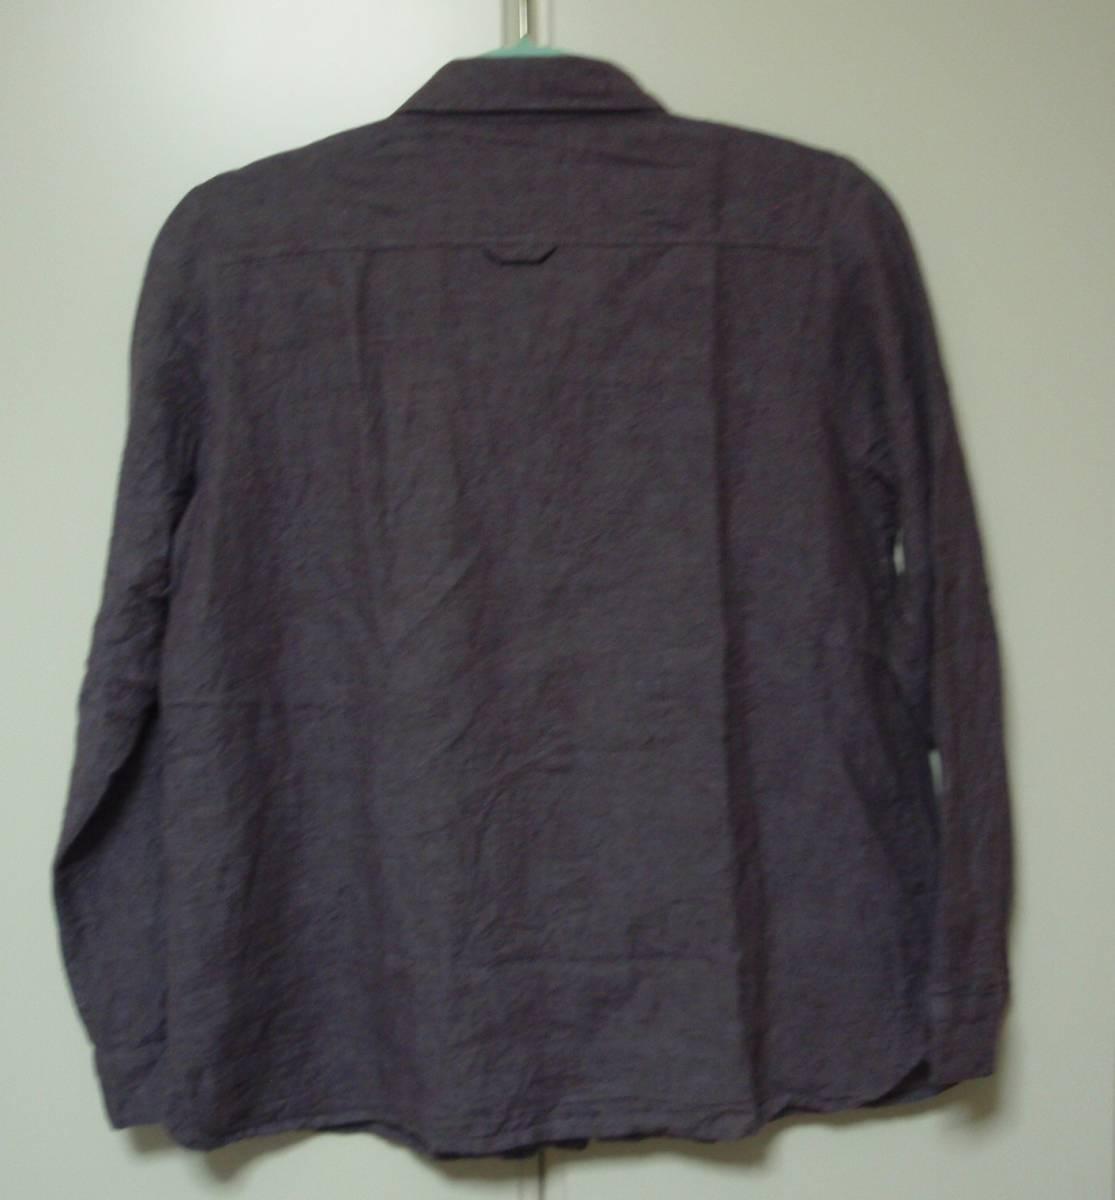 ◇Samansa Mos2 長袖ブラウス 麻74% 長袖シャツ F あずき色 サマンサモスモス_画像3